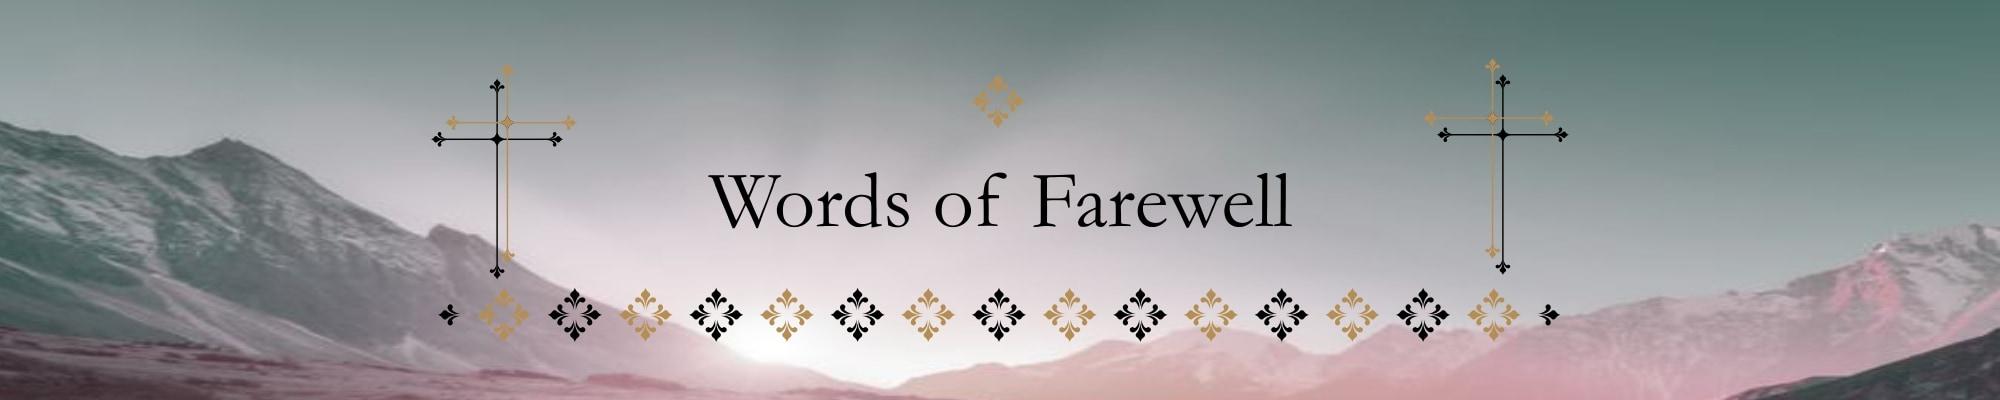 Header Words of Farewell